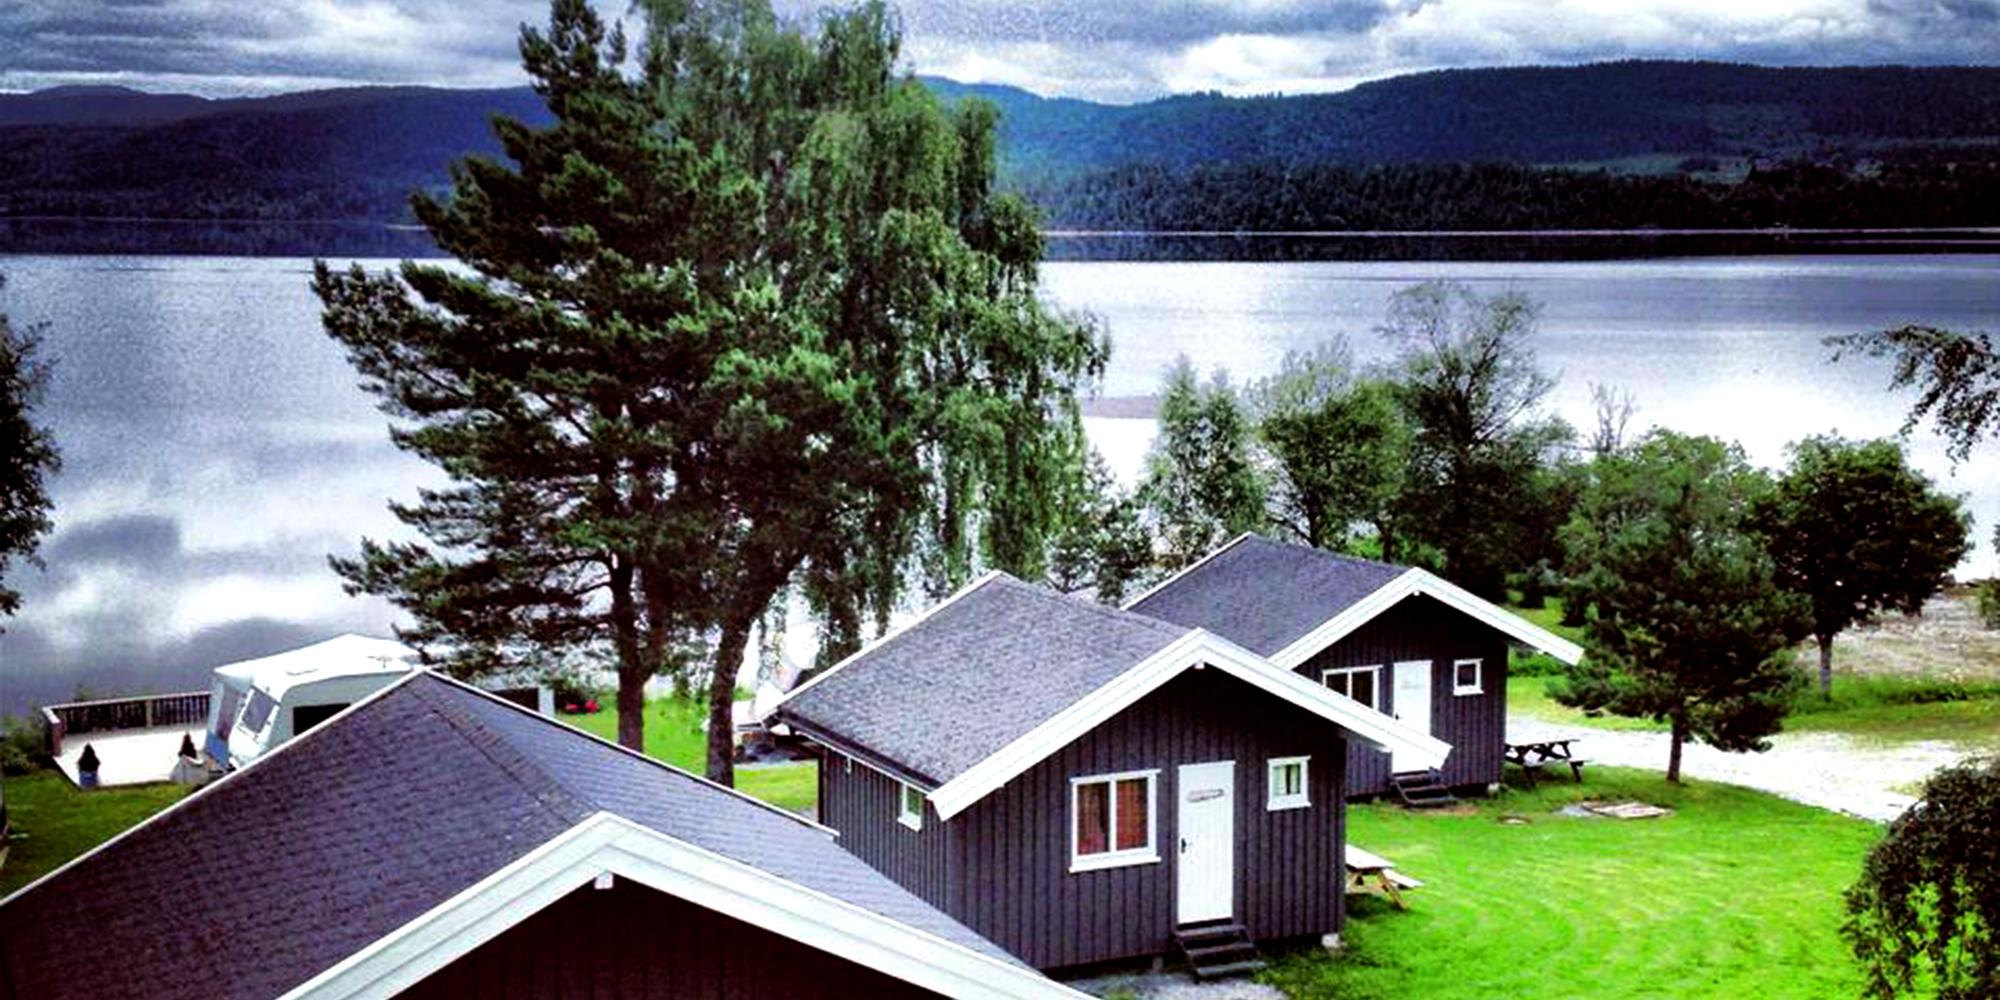 Kvam Motell & Camping